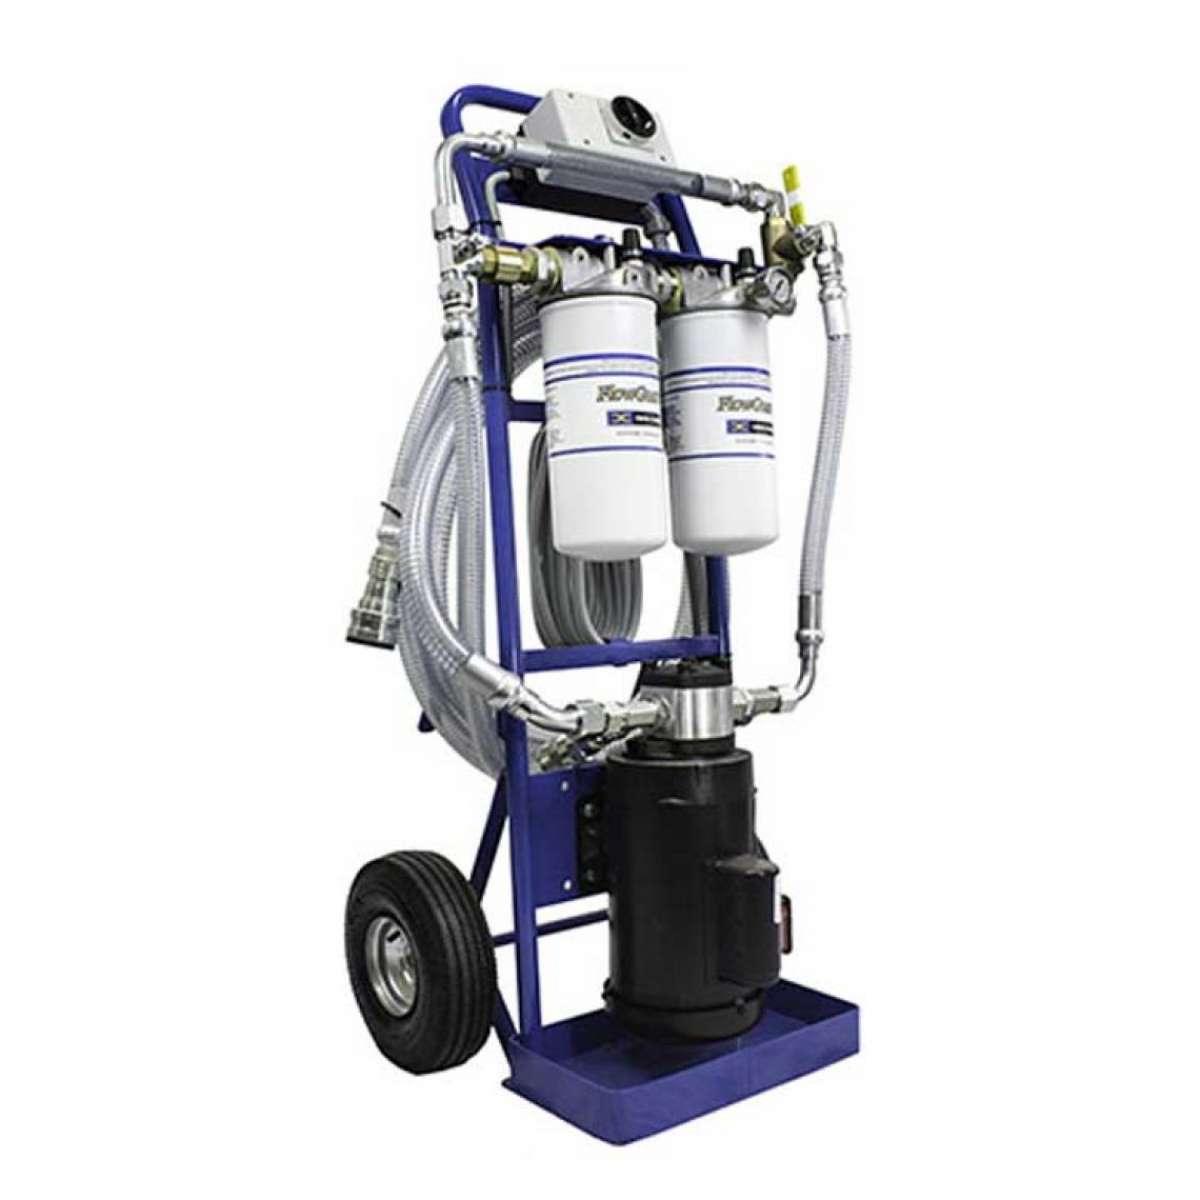 FlowGuard Filter Cart - 5 gpm pump 1 hp electric motor 115 vac 60 hz 1725 rpms 13 amps